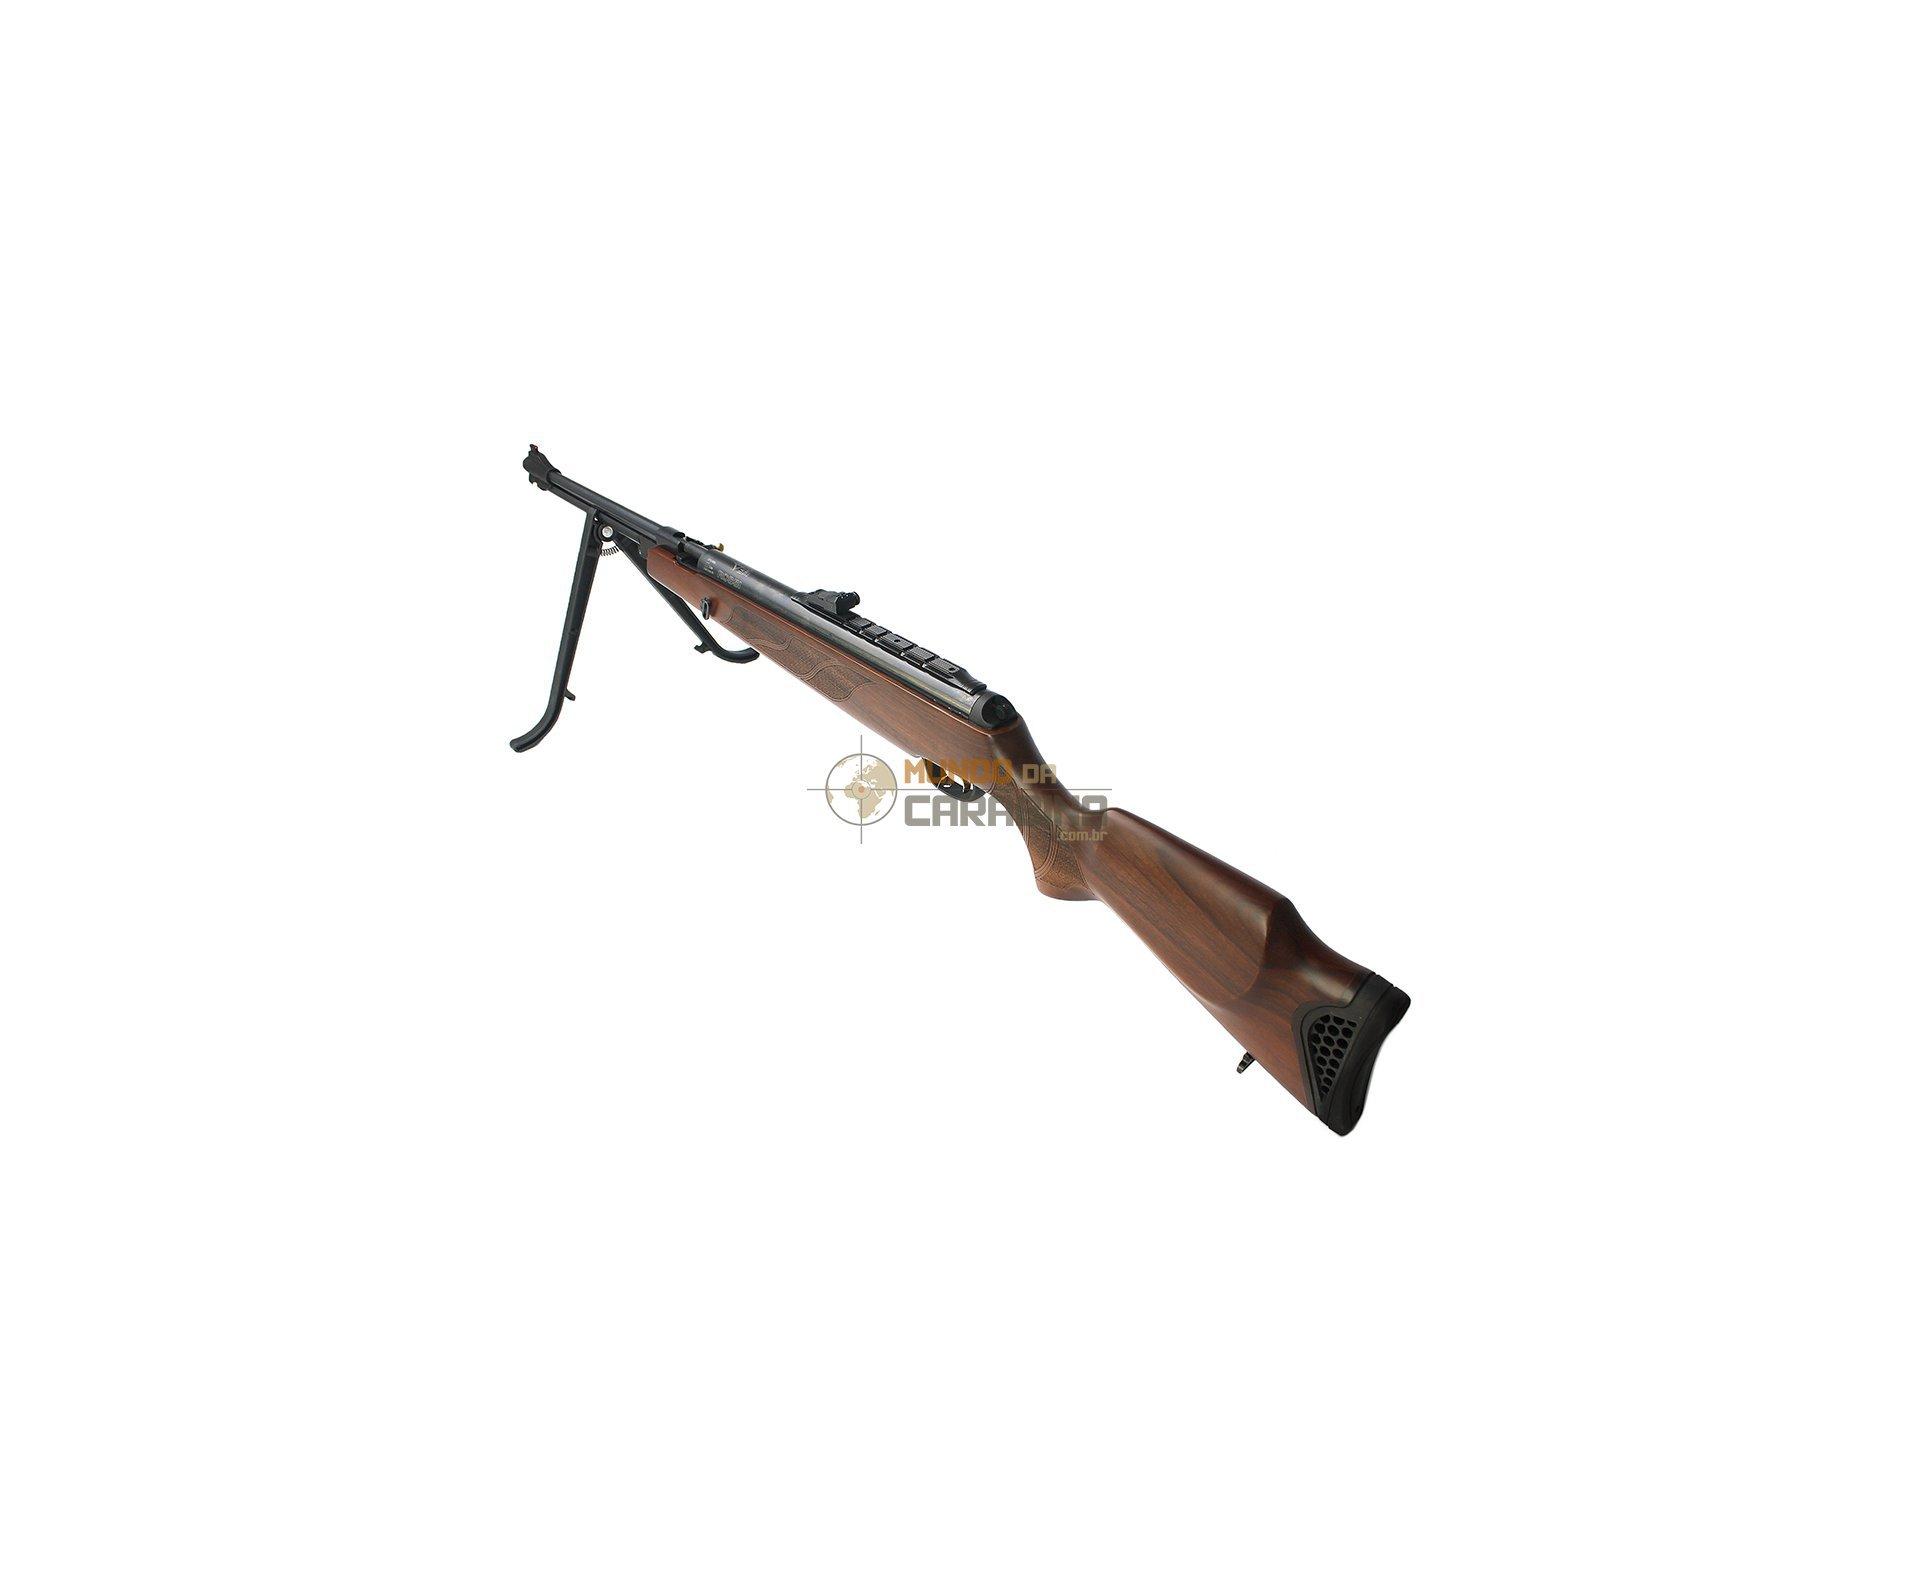 "Carabina De Pressão Hatsan Ht 155 - Calibre 5,5 Mm - Sistema Sas + Capa 52"""